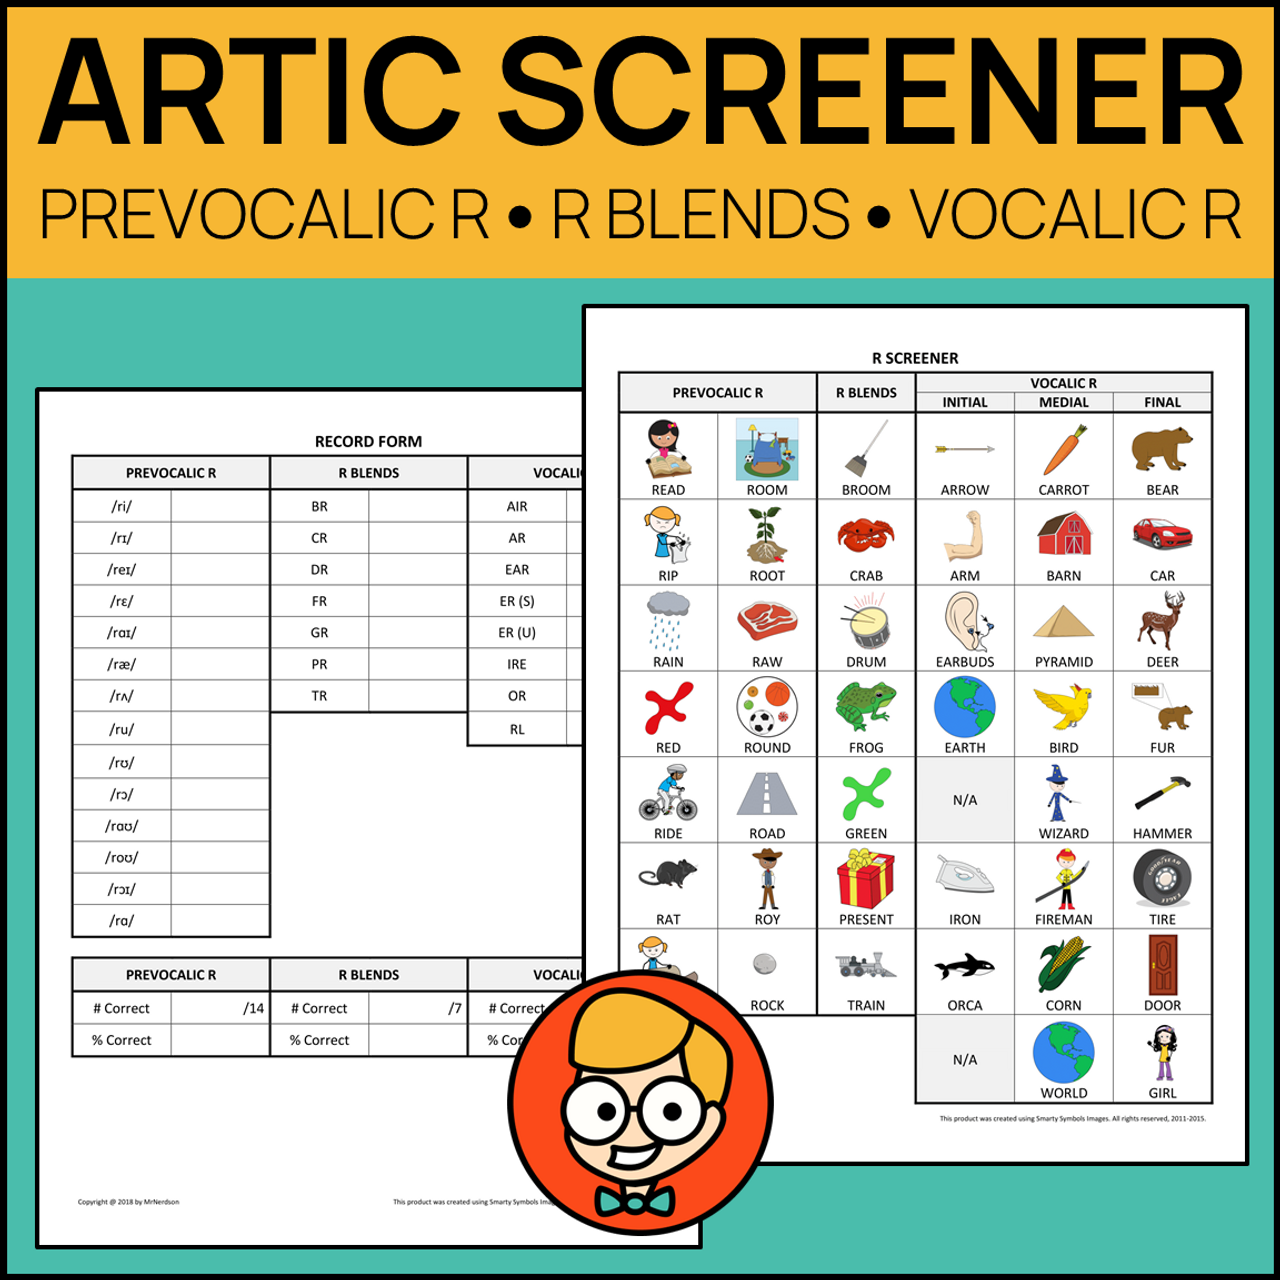 Comprehensive Articulation Screener for R: Prevocalic, Blends, Vocalic